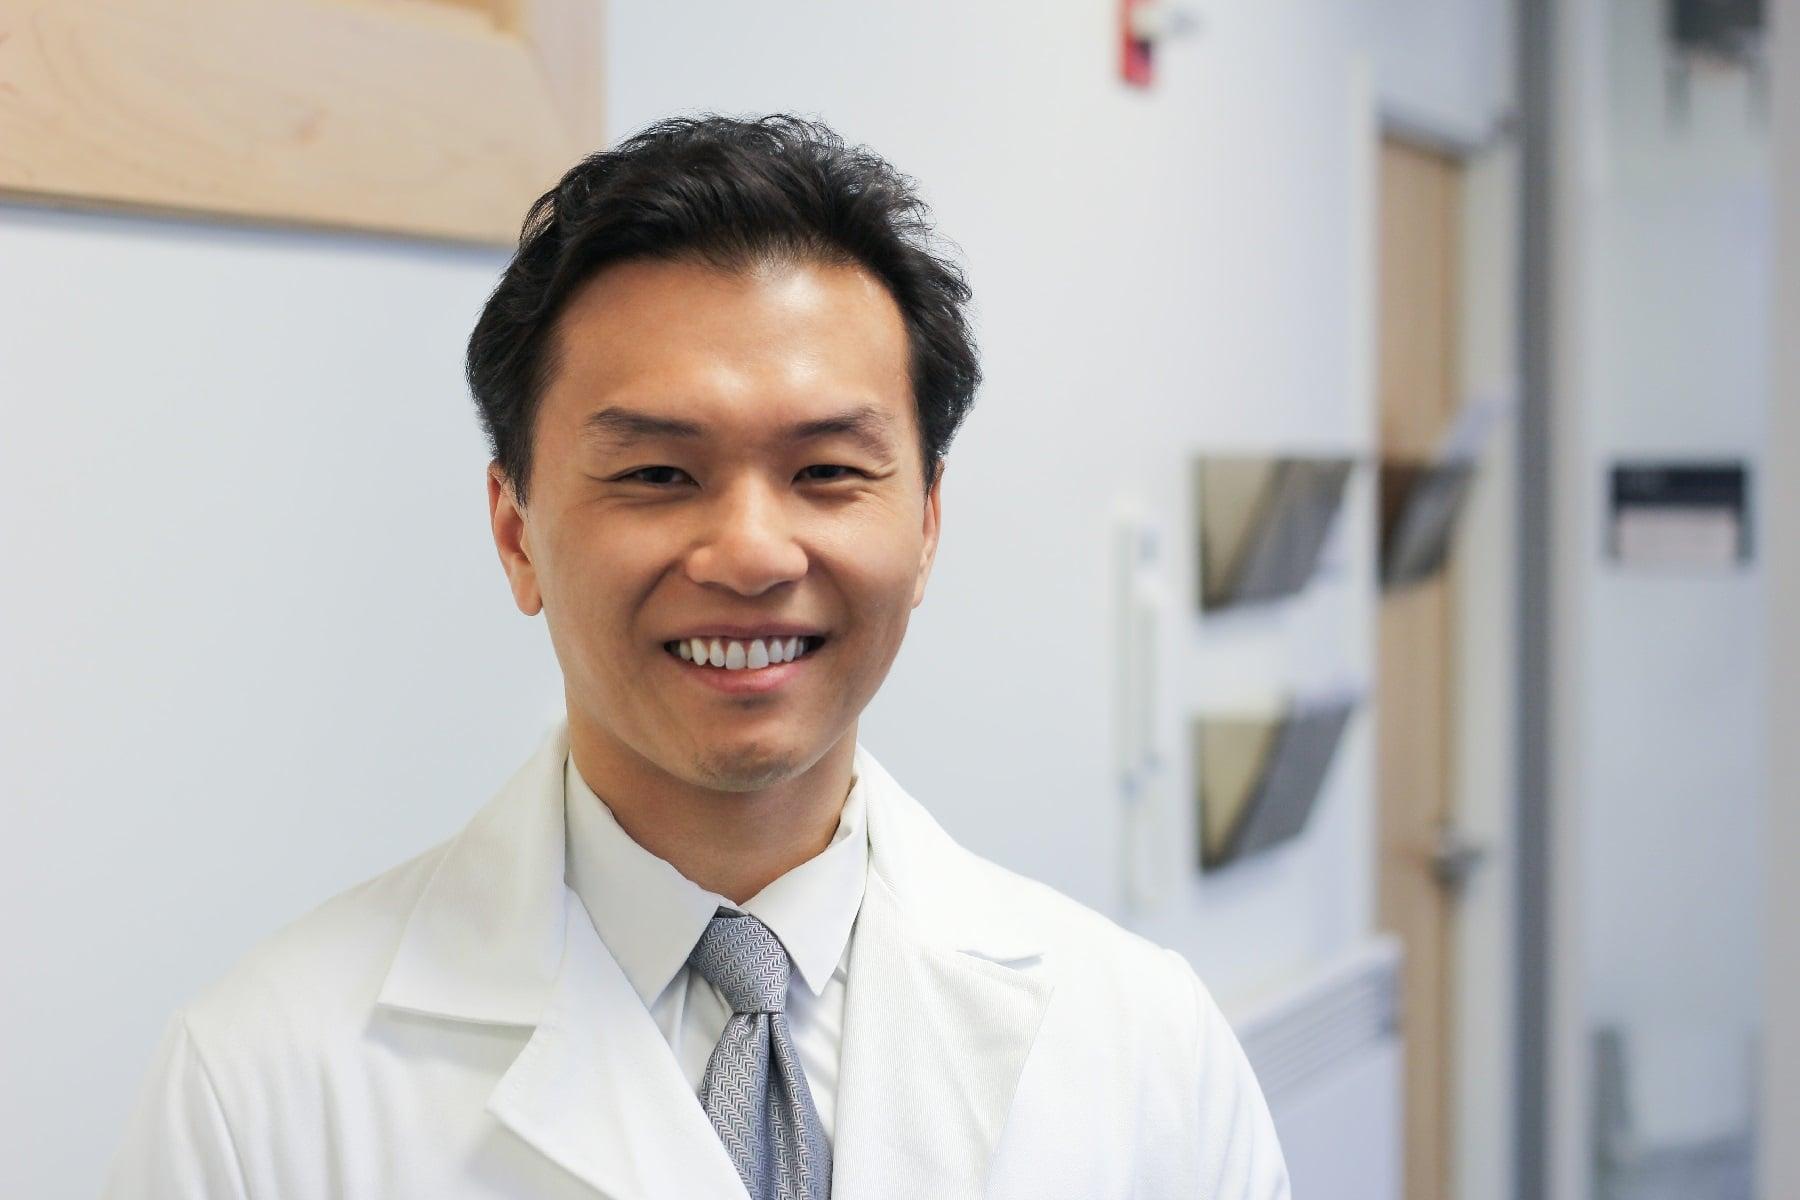 Shuhan He, MD